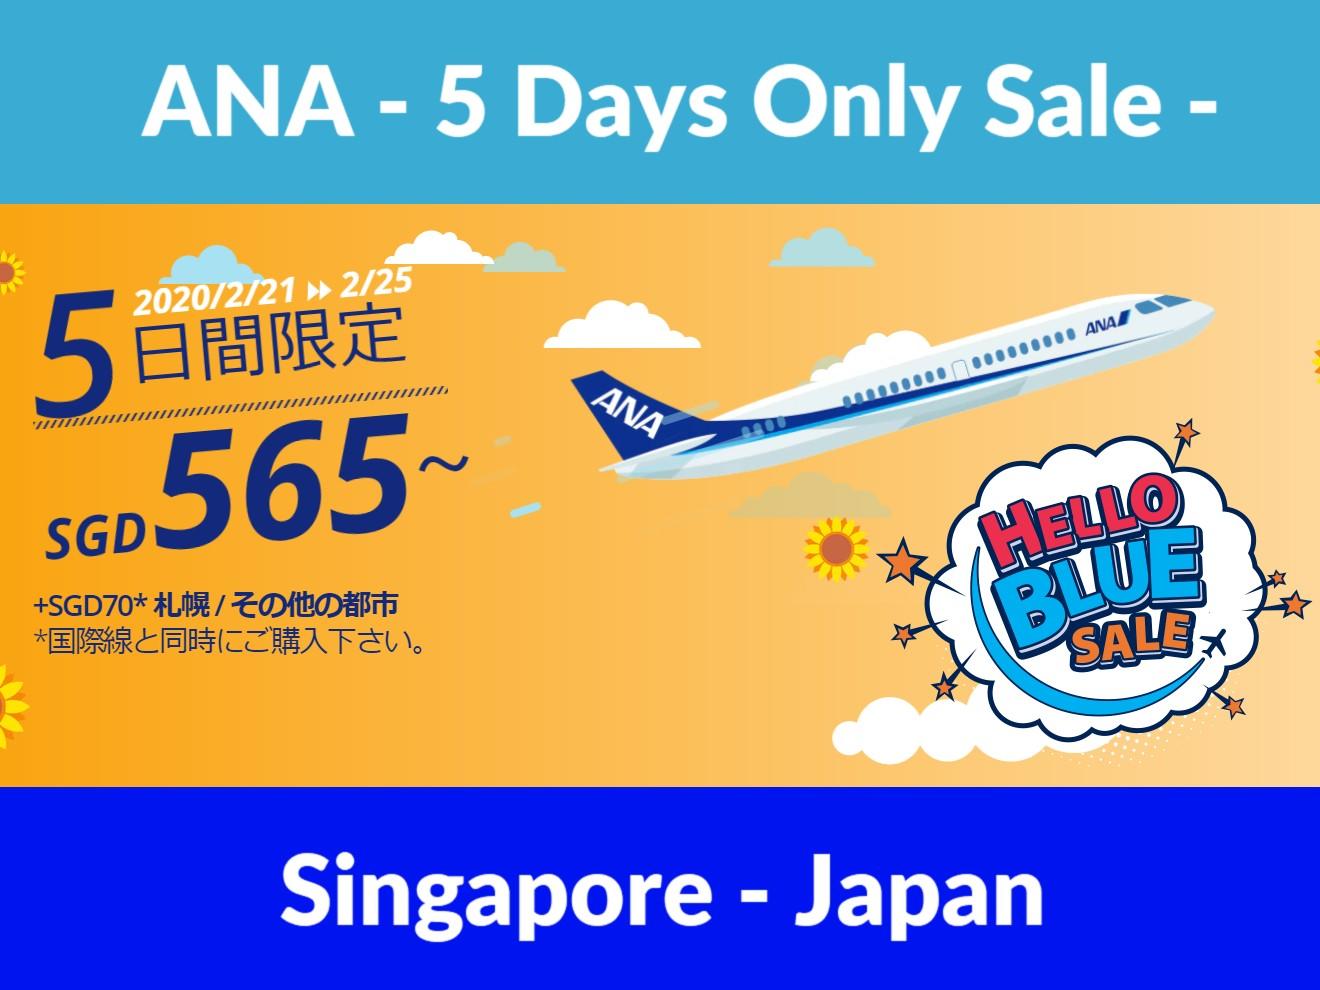 ANA 5 Days Only Sale